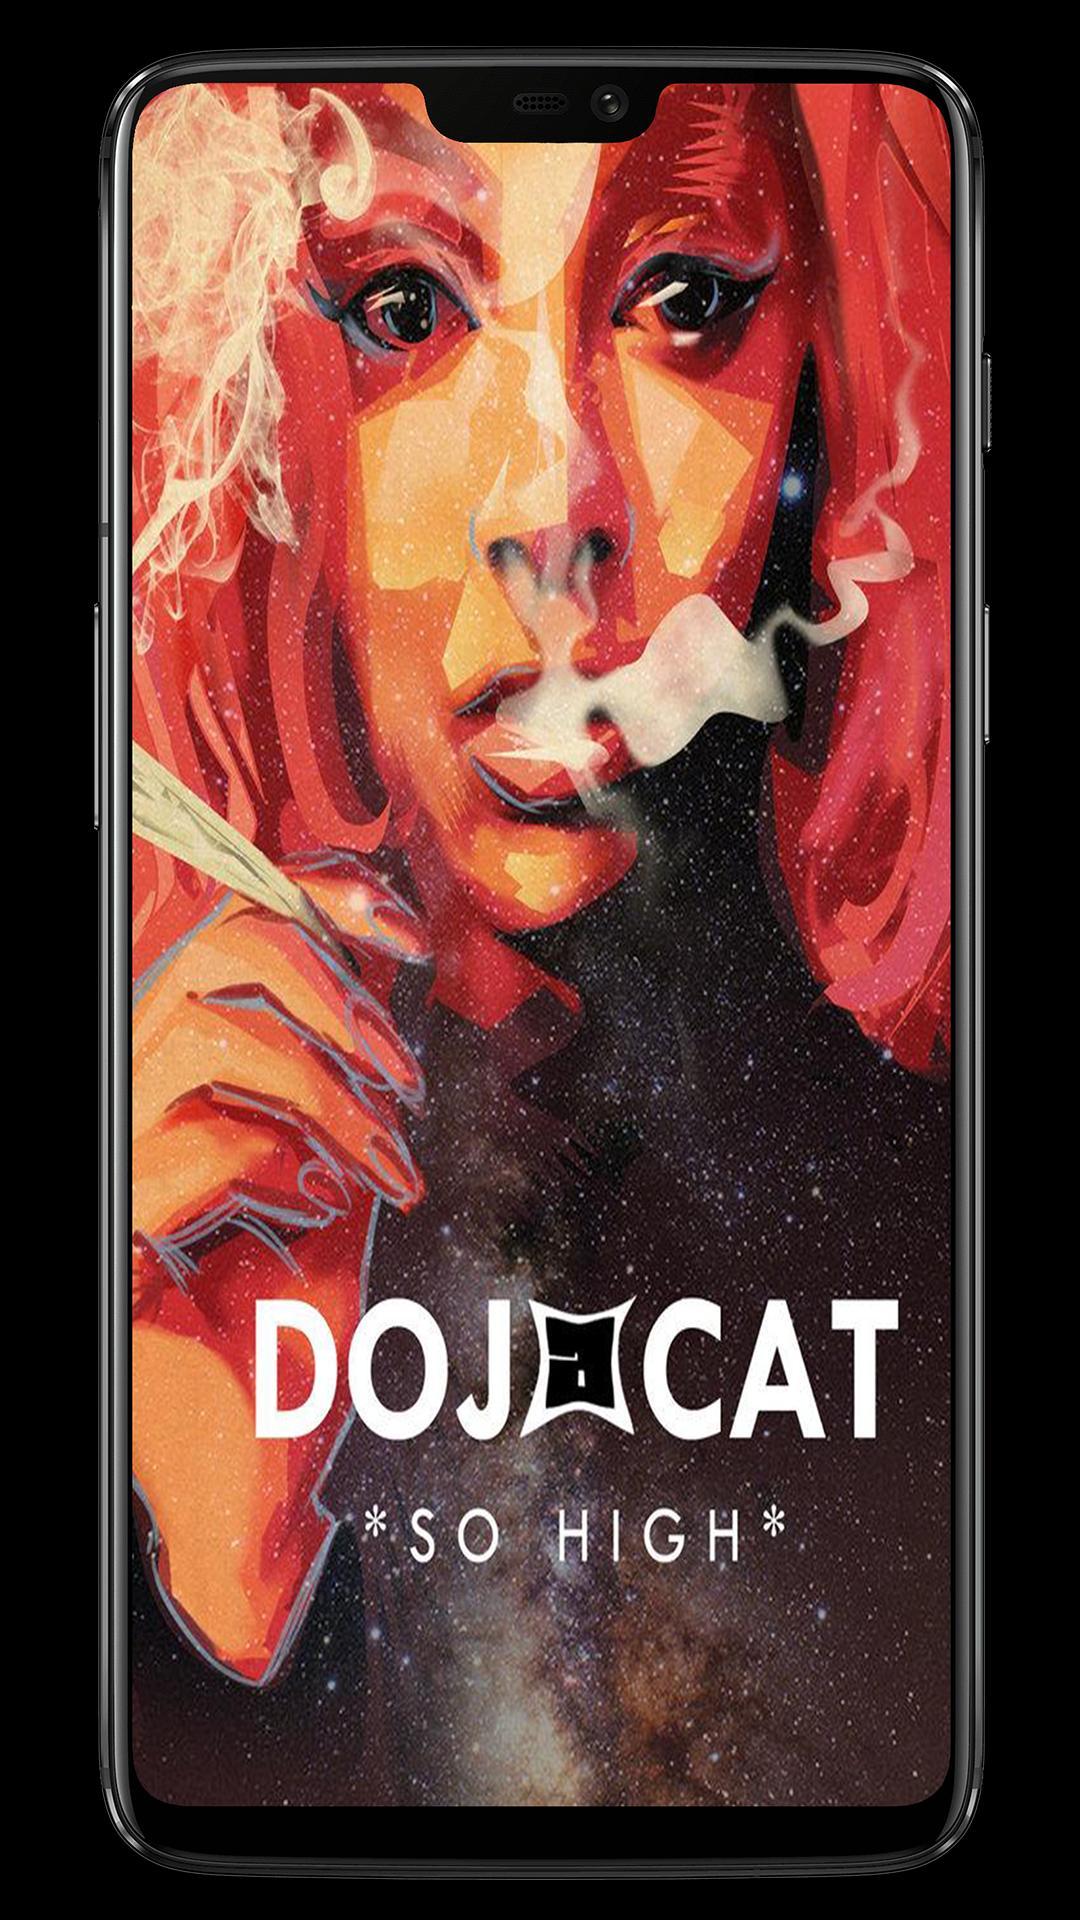 Doja Cat Wallpaper 4k For Android Apk Download